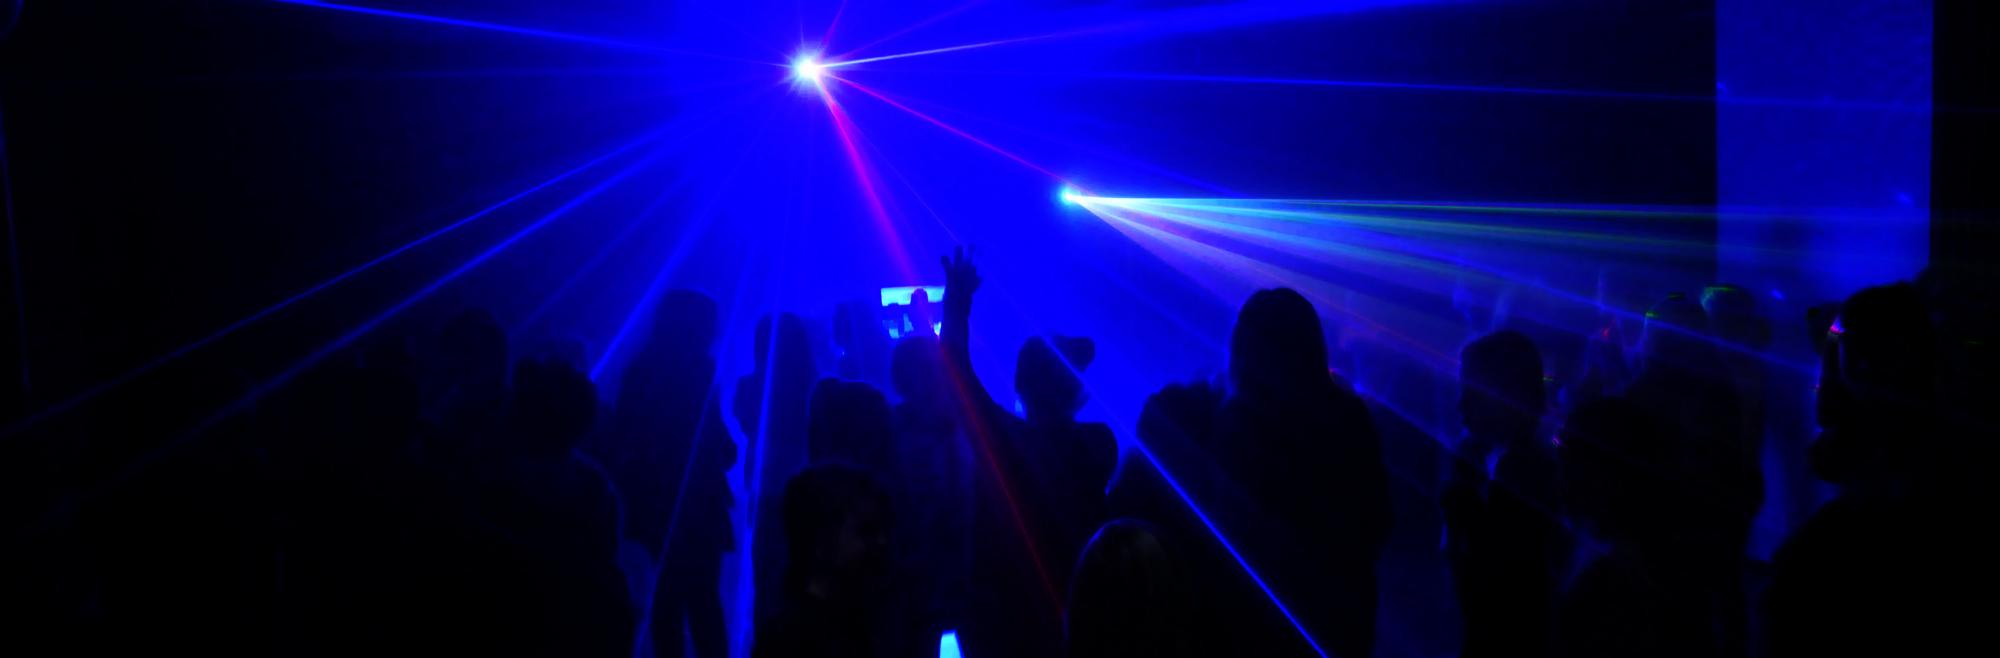 <p>DANCE e-VEN-t | ZATERDAG 2 JUNI 2018</p>